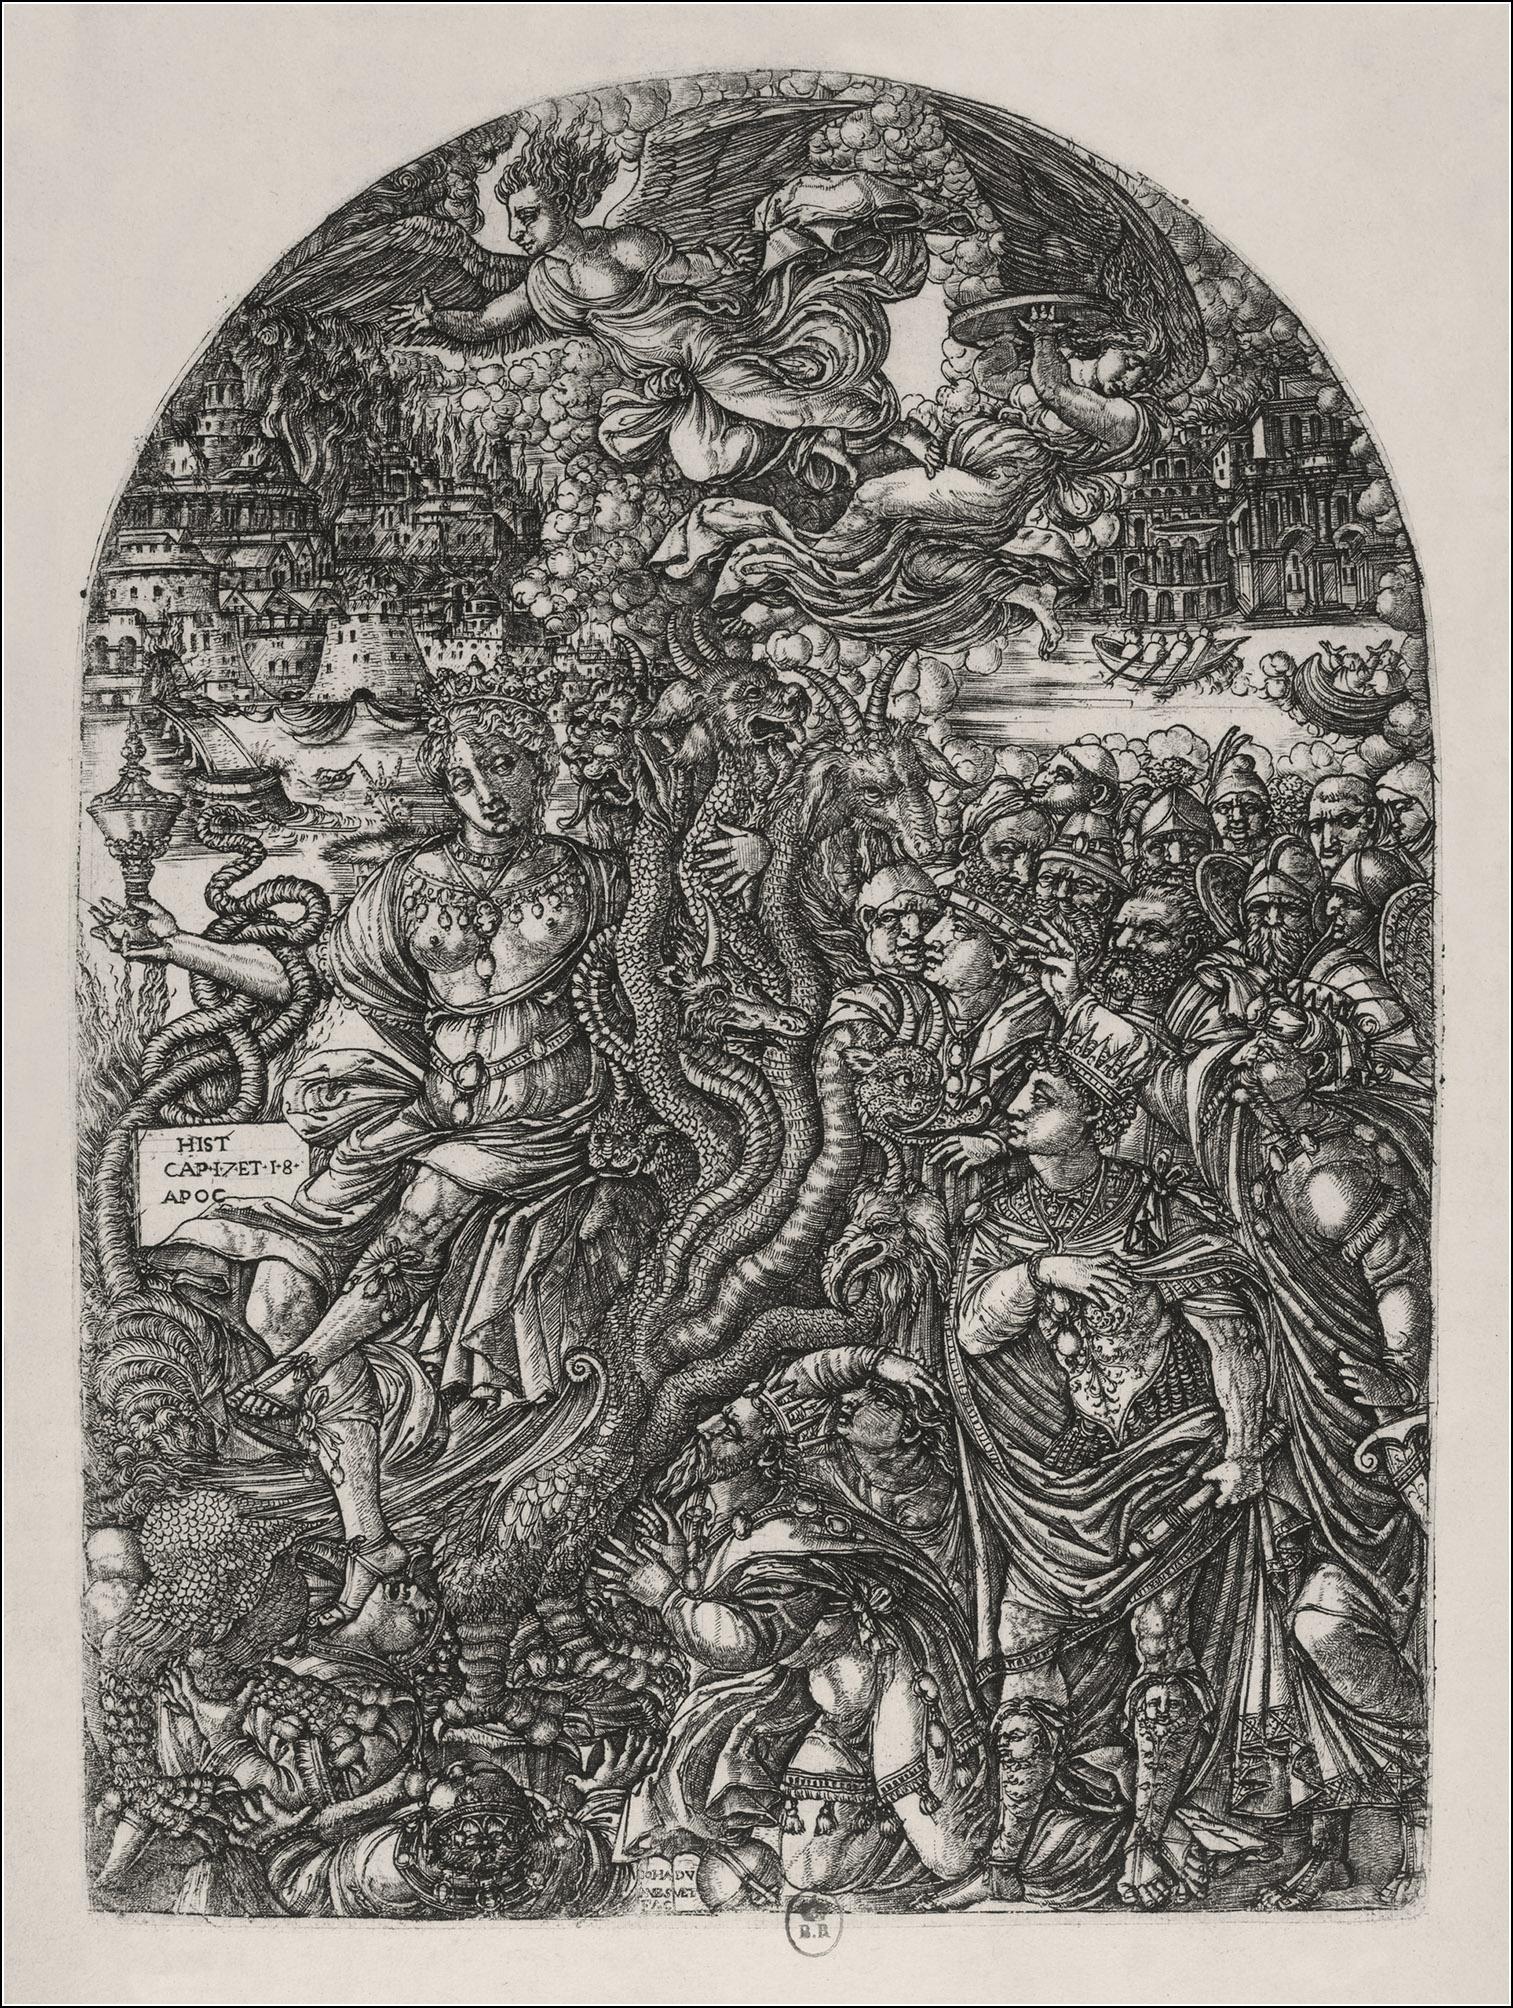 Jean Duvet, Lapocalypse figuree